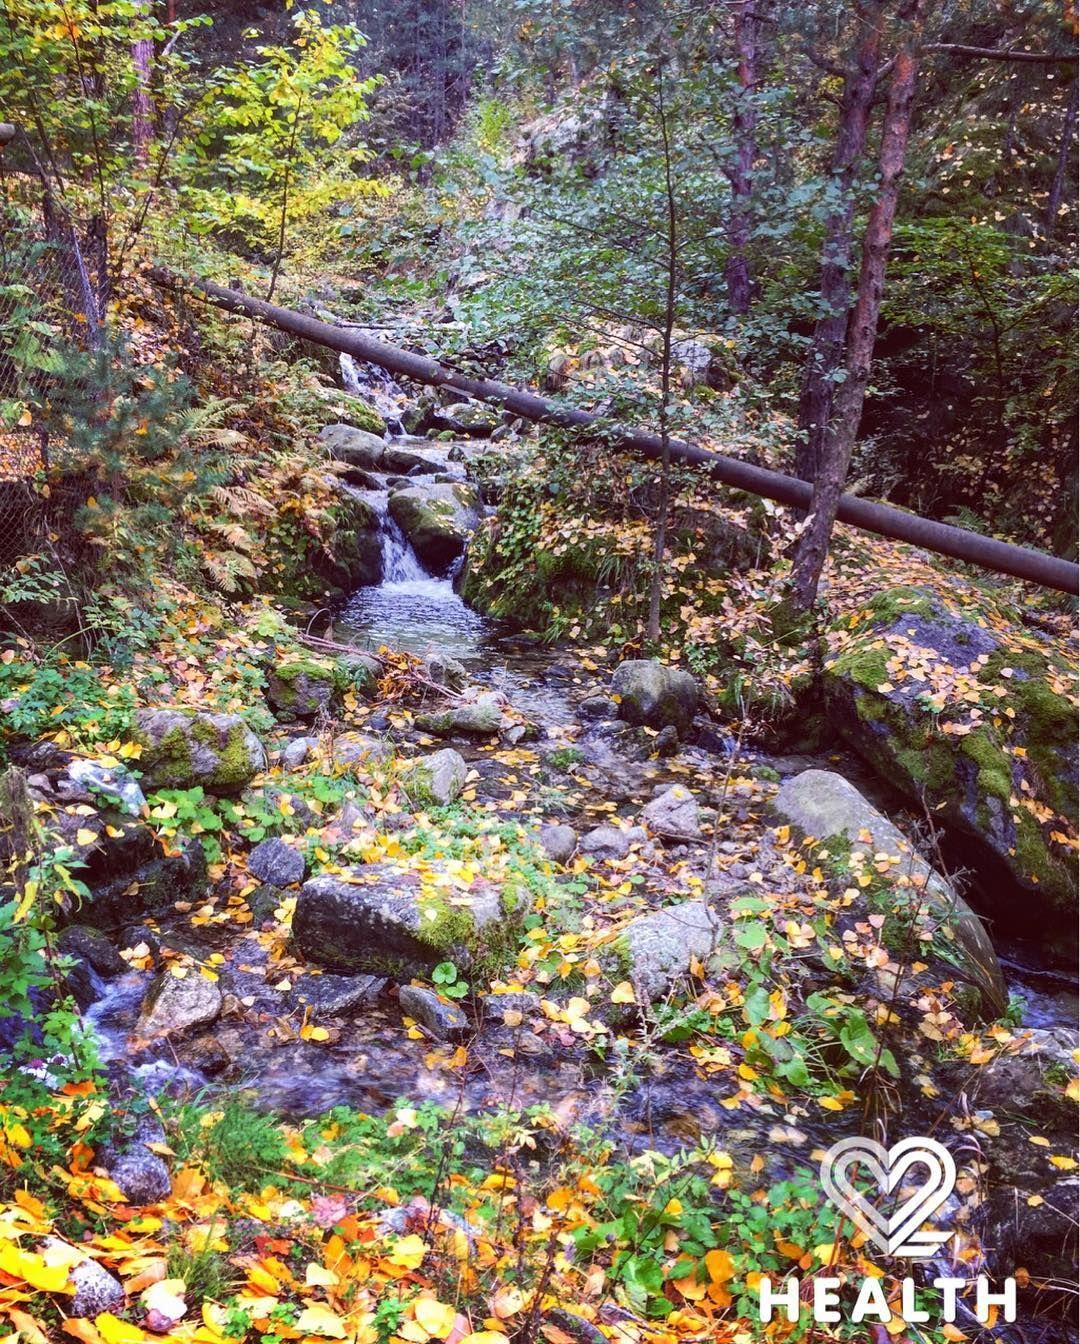 I  autumn!  #hiking #hike #weekendvibes #weekend #mountain #nature #naturelovers #naturephotography #mothernature #autumn #autumnleaves #travel #travelgram #travelphotography #traveltheworld #bulgaria #countryside #beautifuldestinations